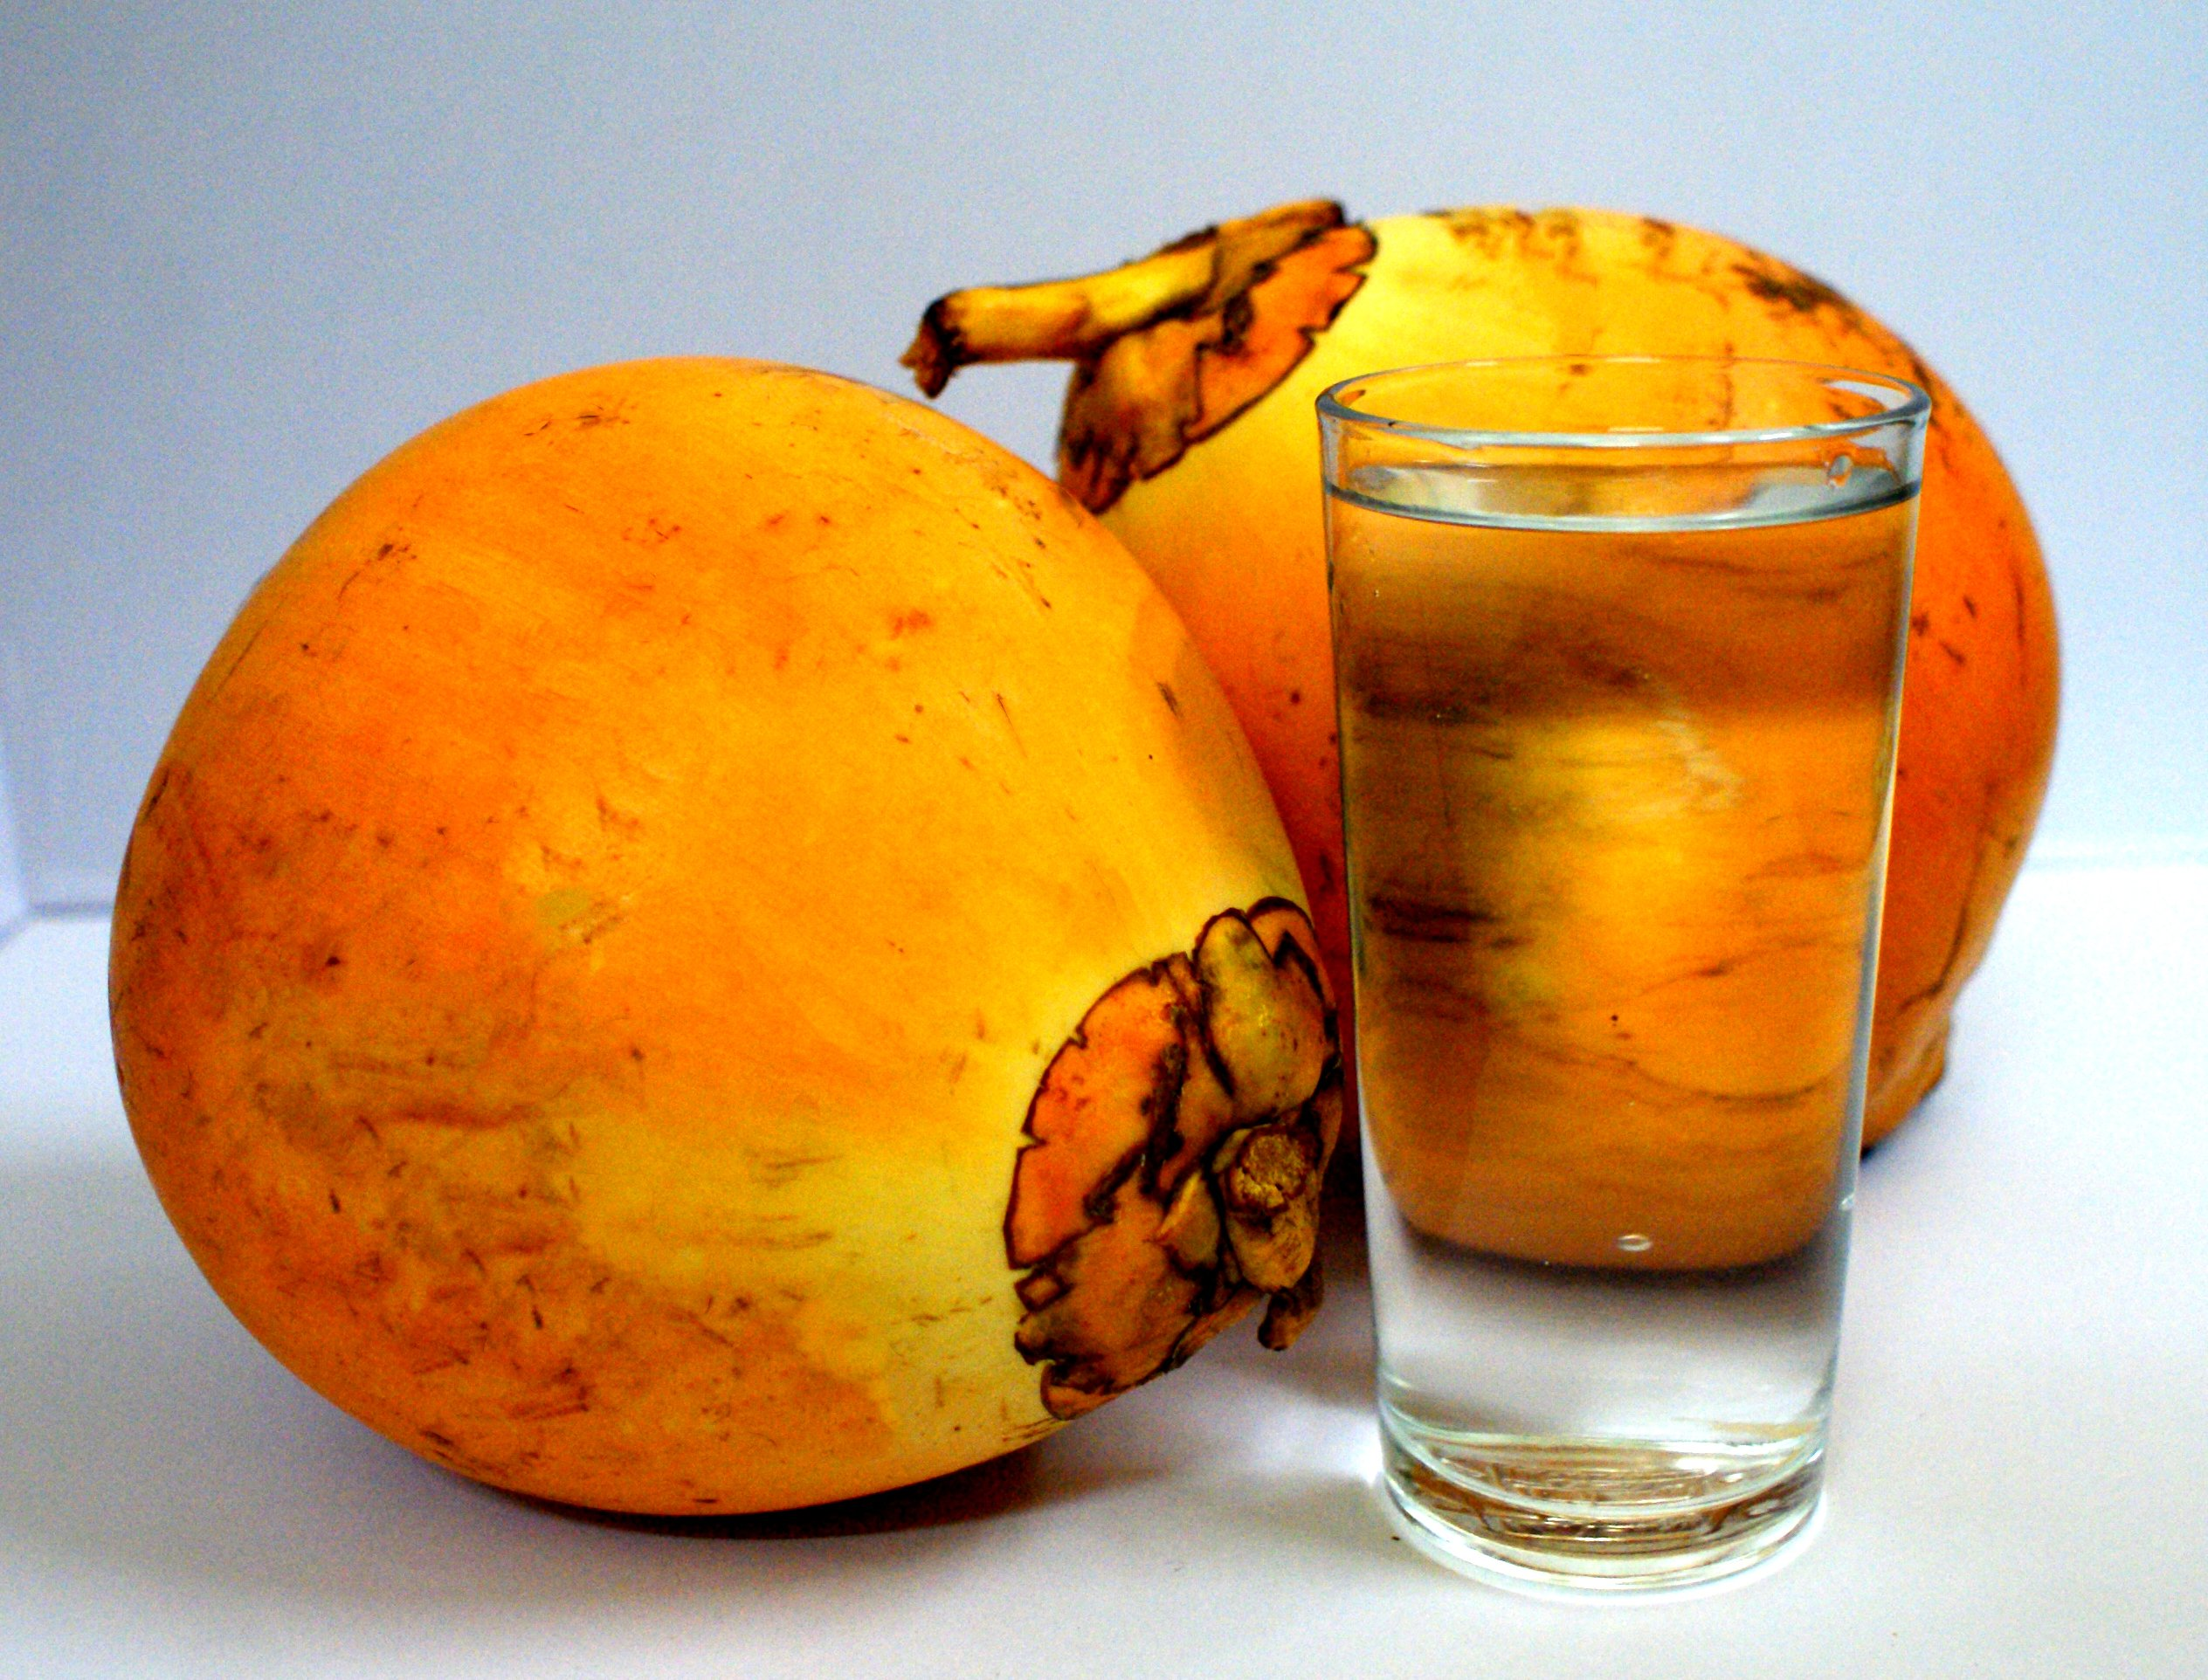 King coconut seed